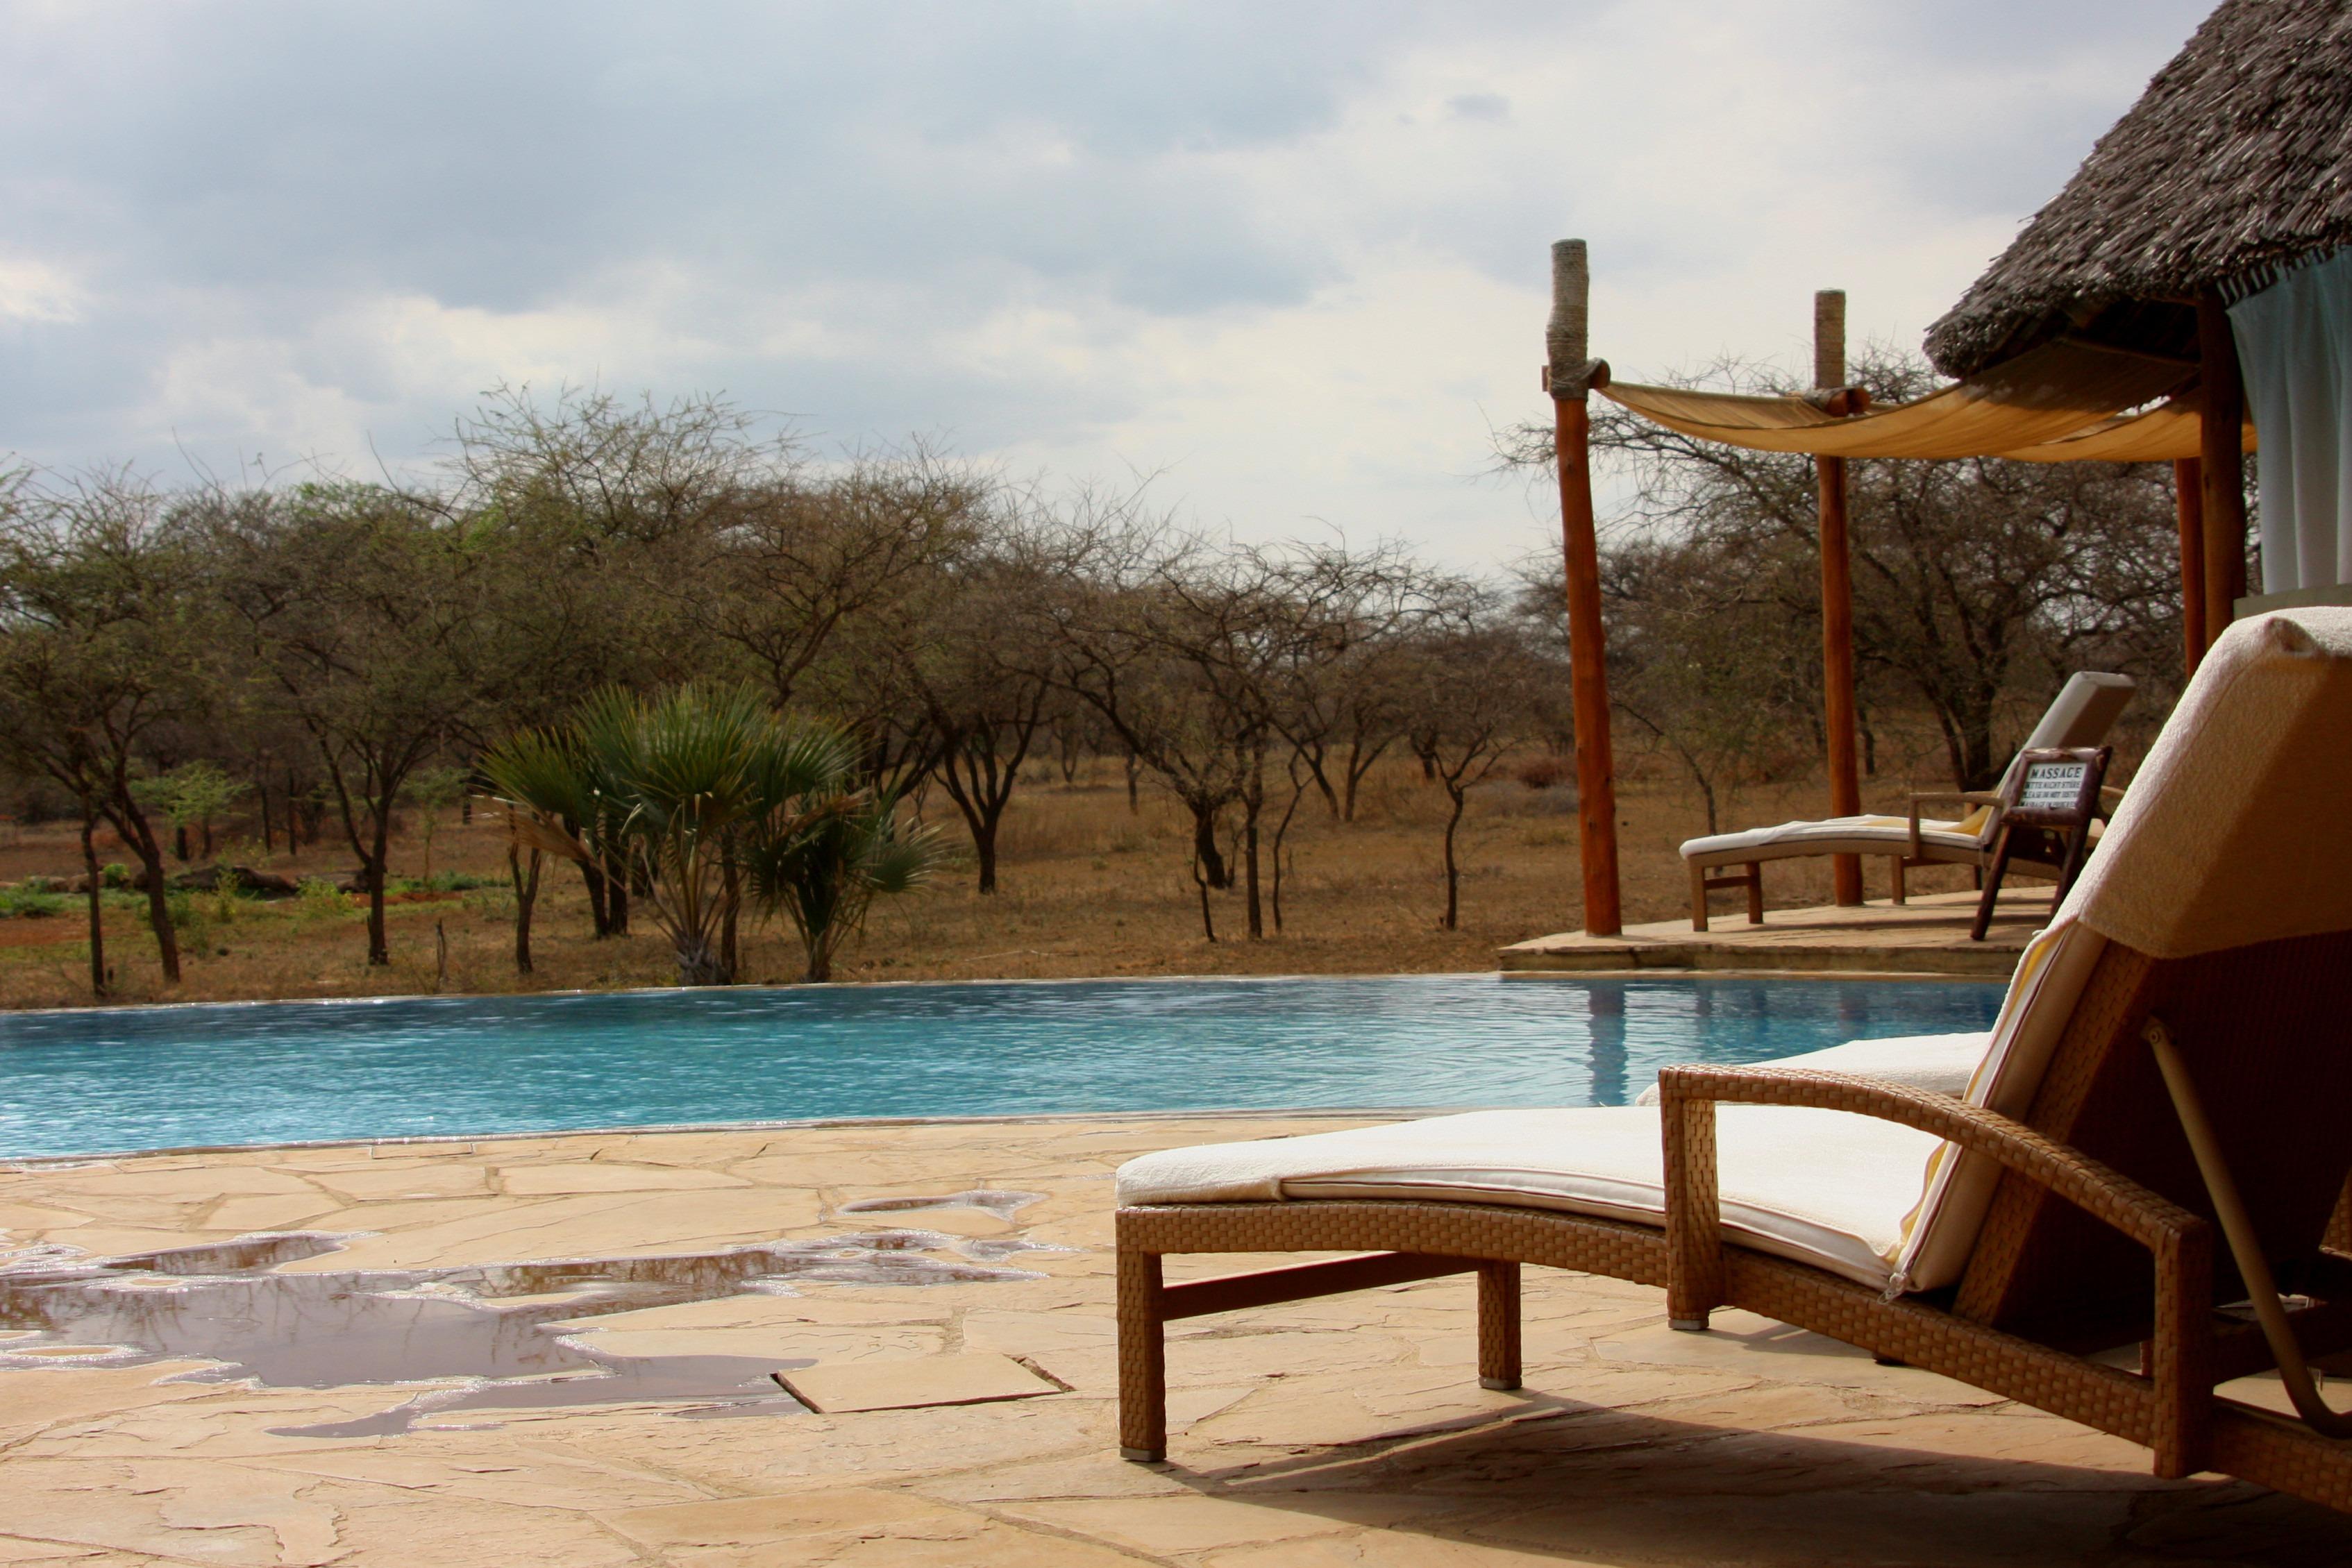 Fotos gratis : paisaje, árbol, agua, vacaciones, recreación, piscina ...